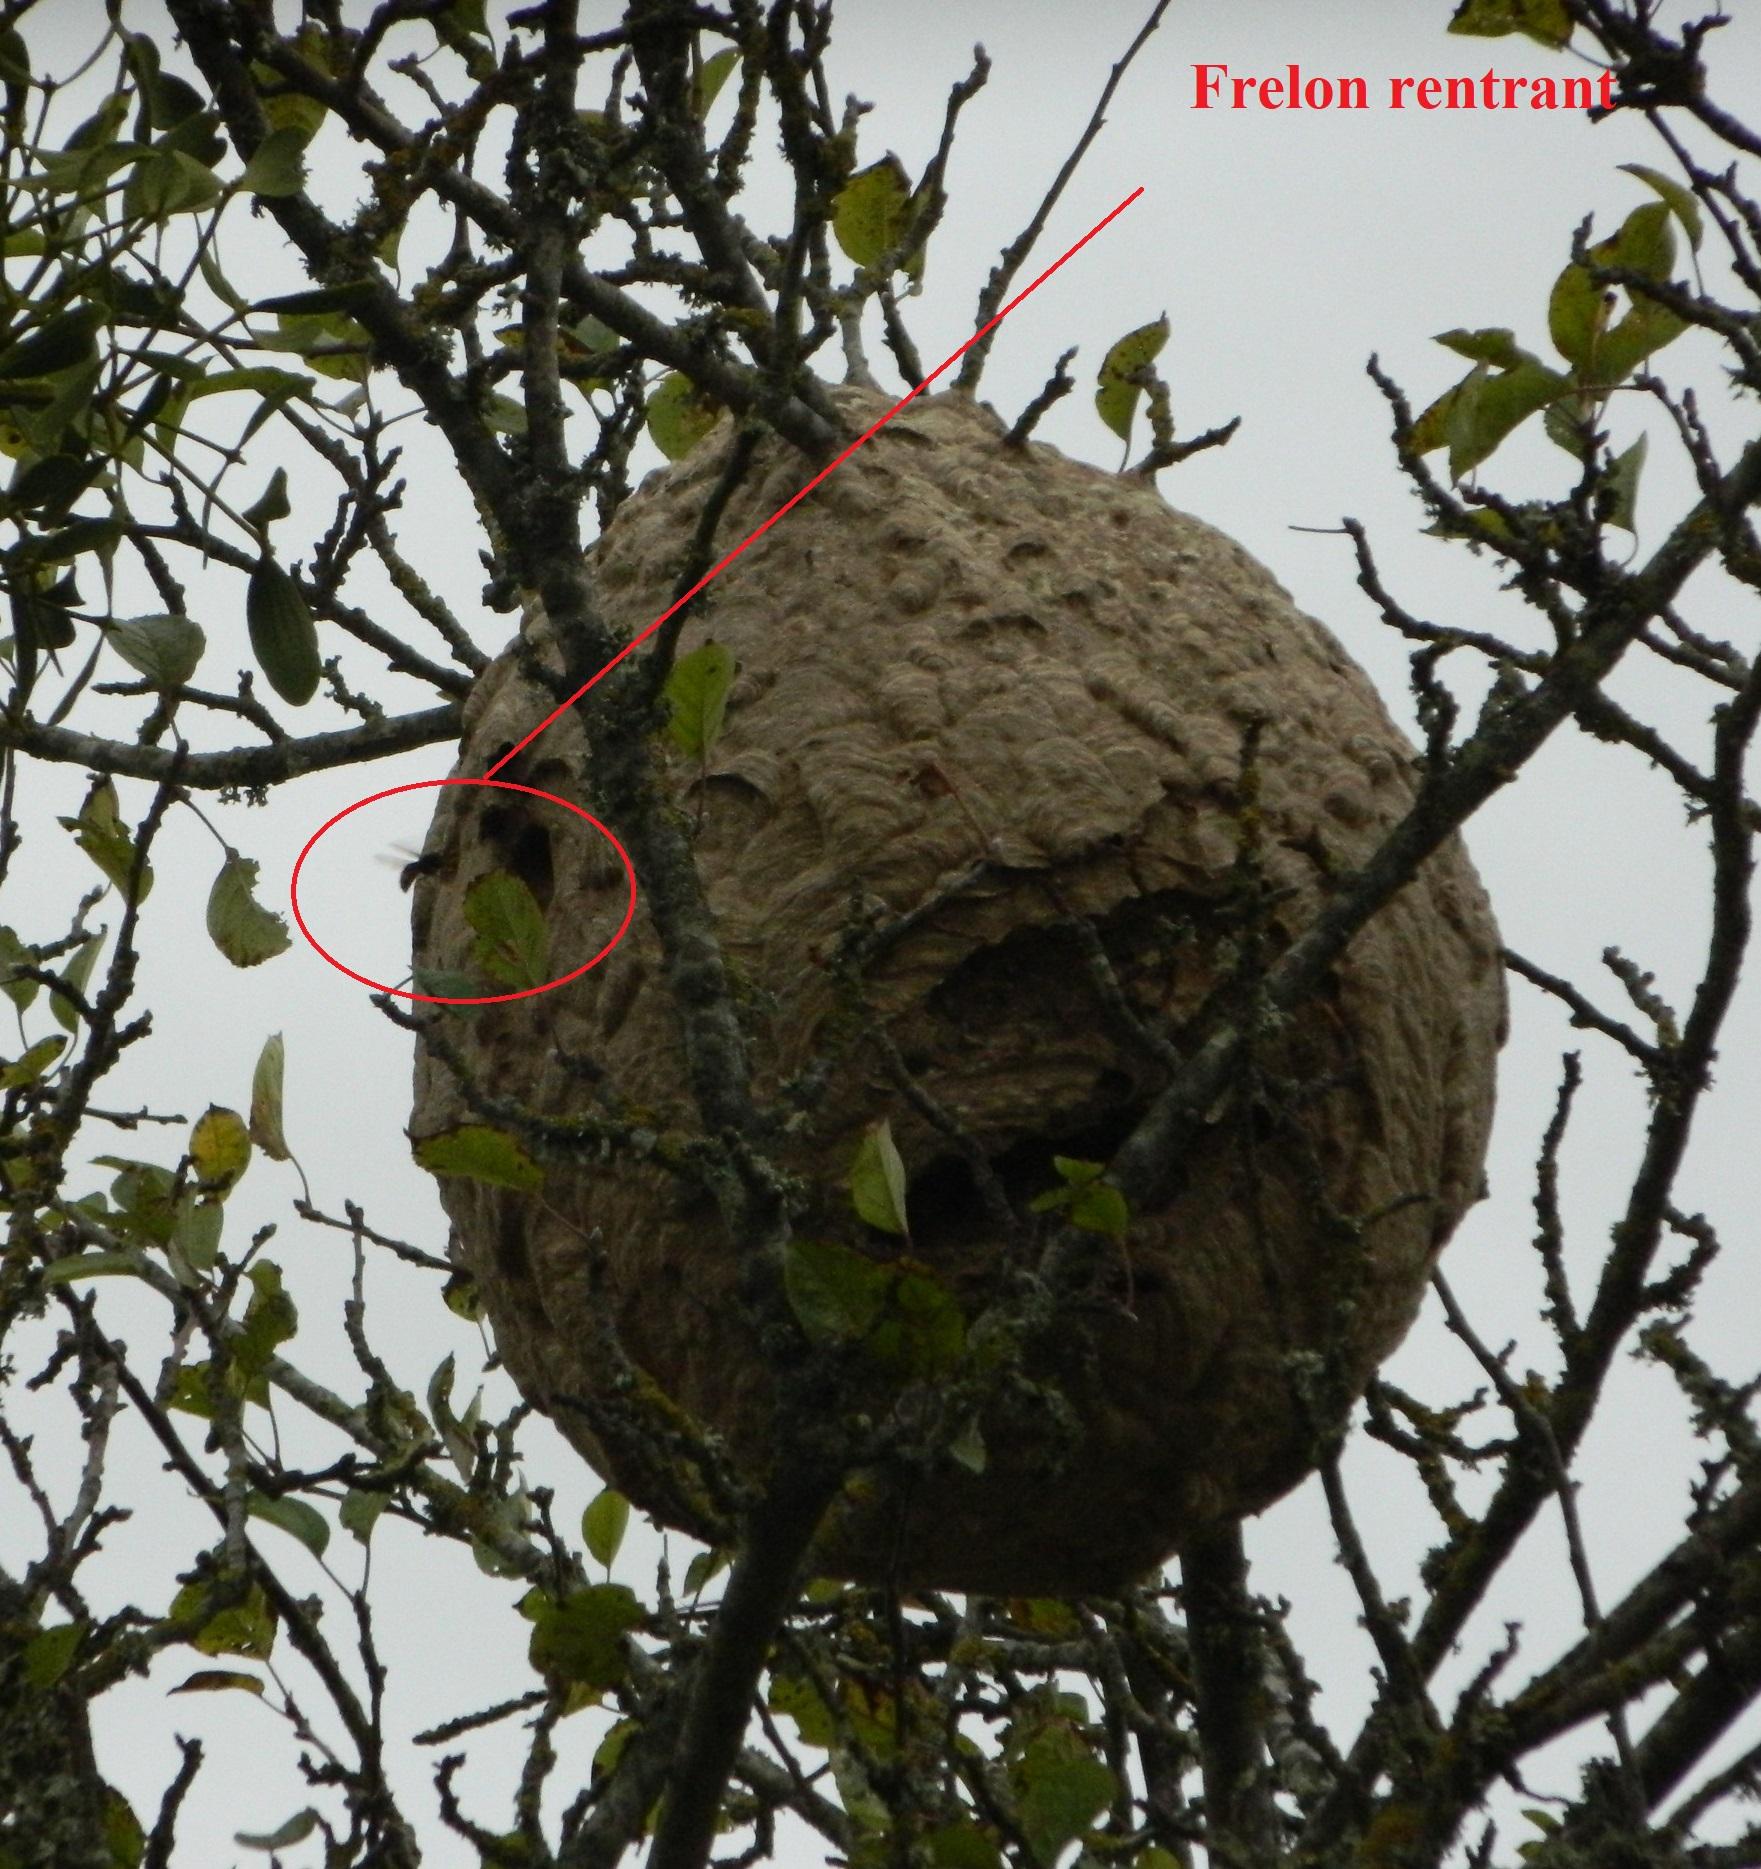 nid à 1 km de la ruche le 2 novembre 2019.